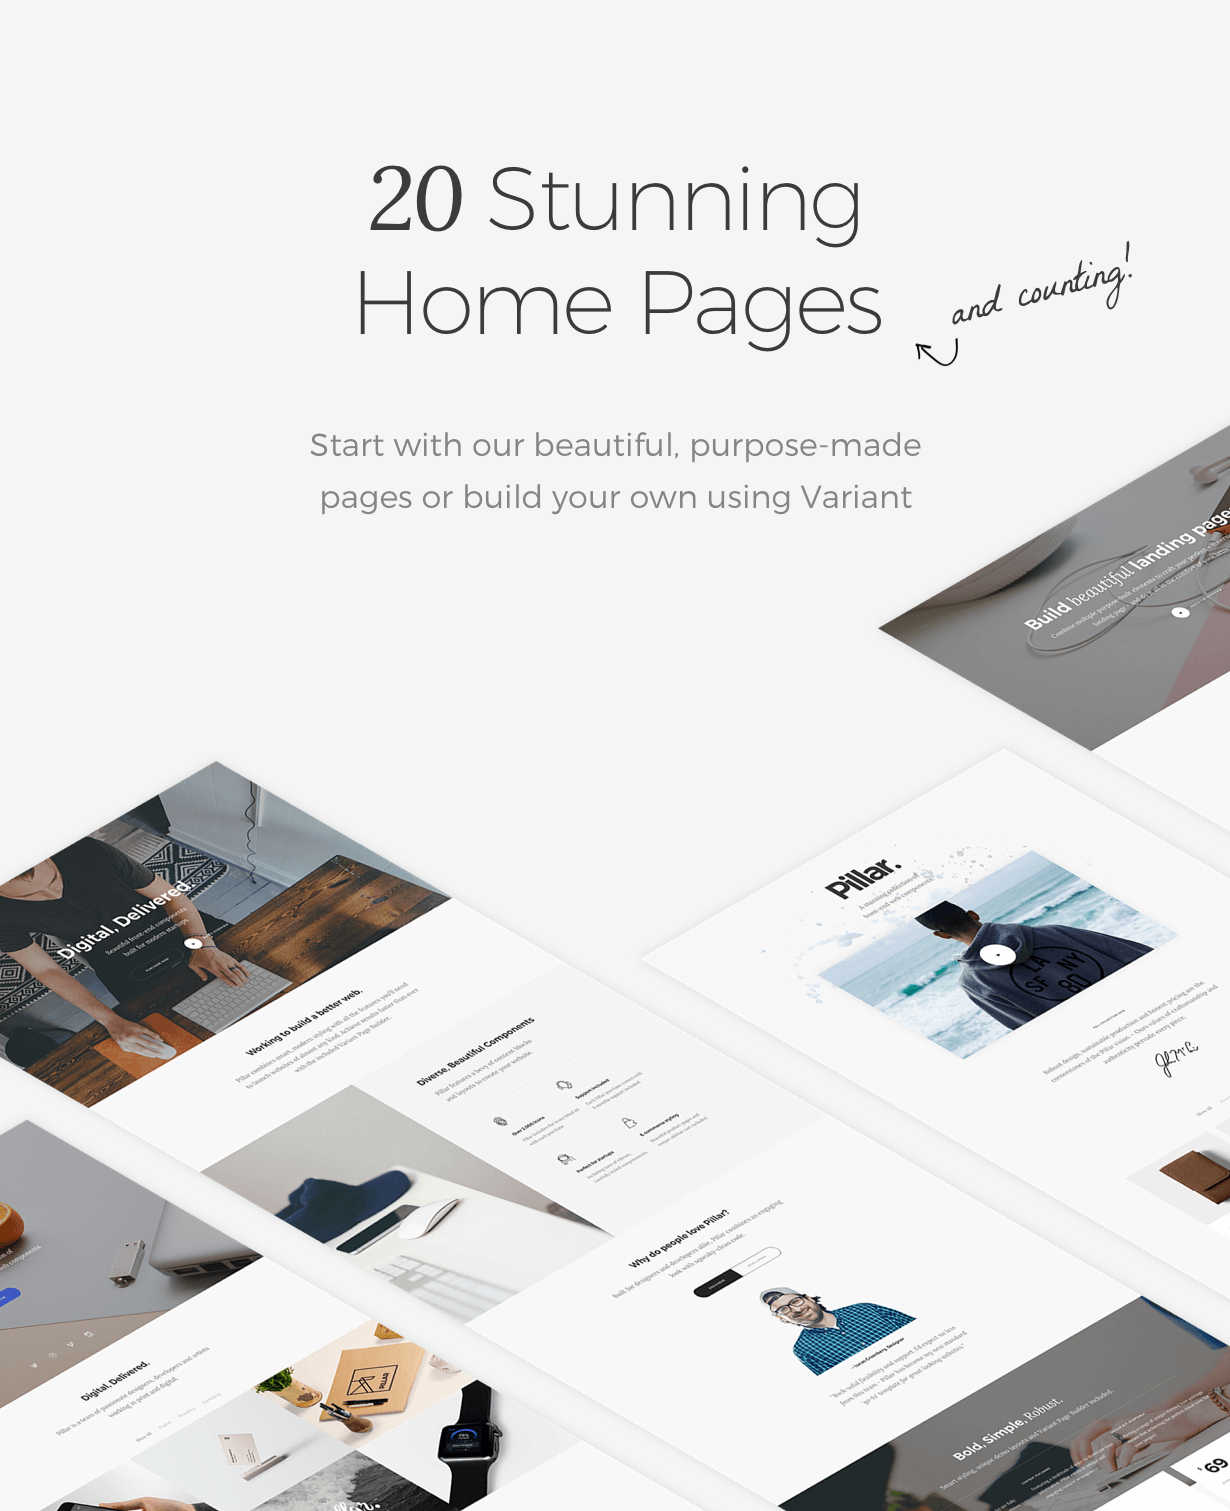 Pillar - 20 stunning homepages